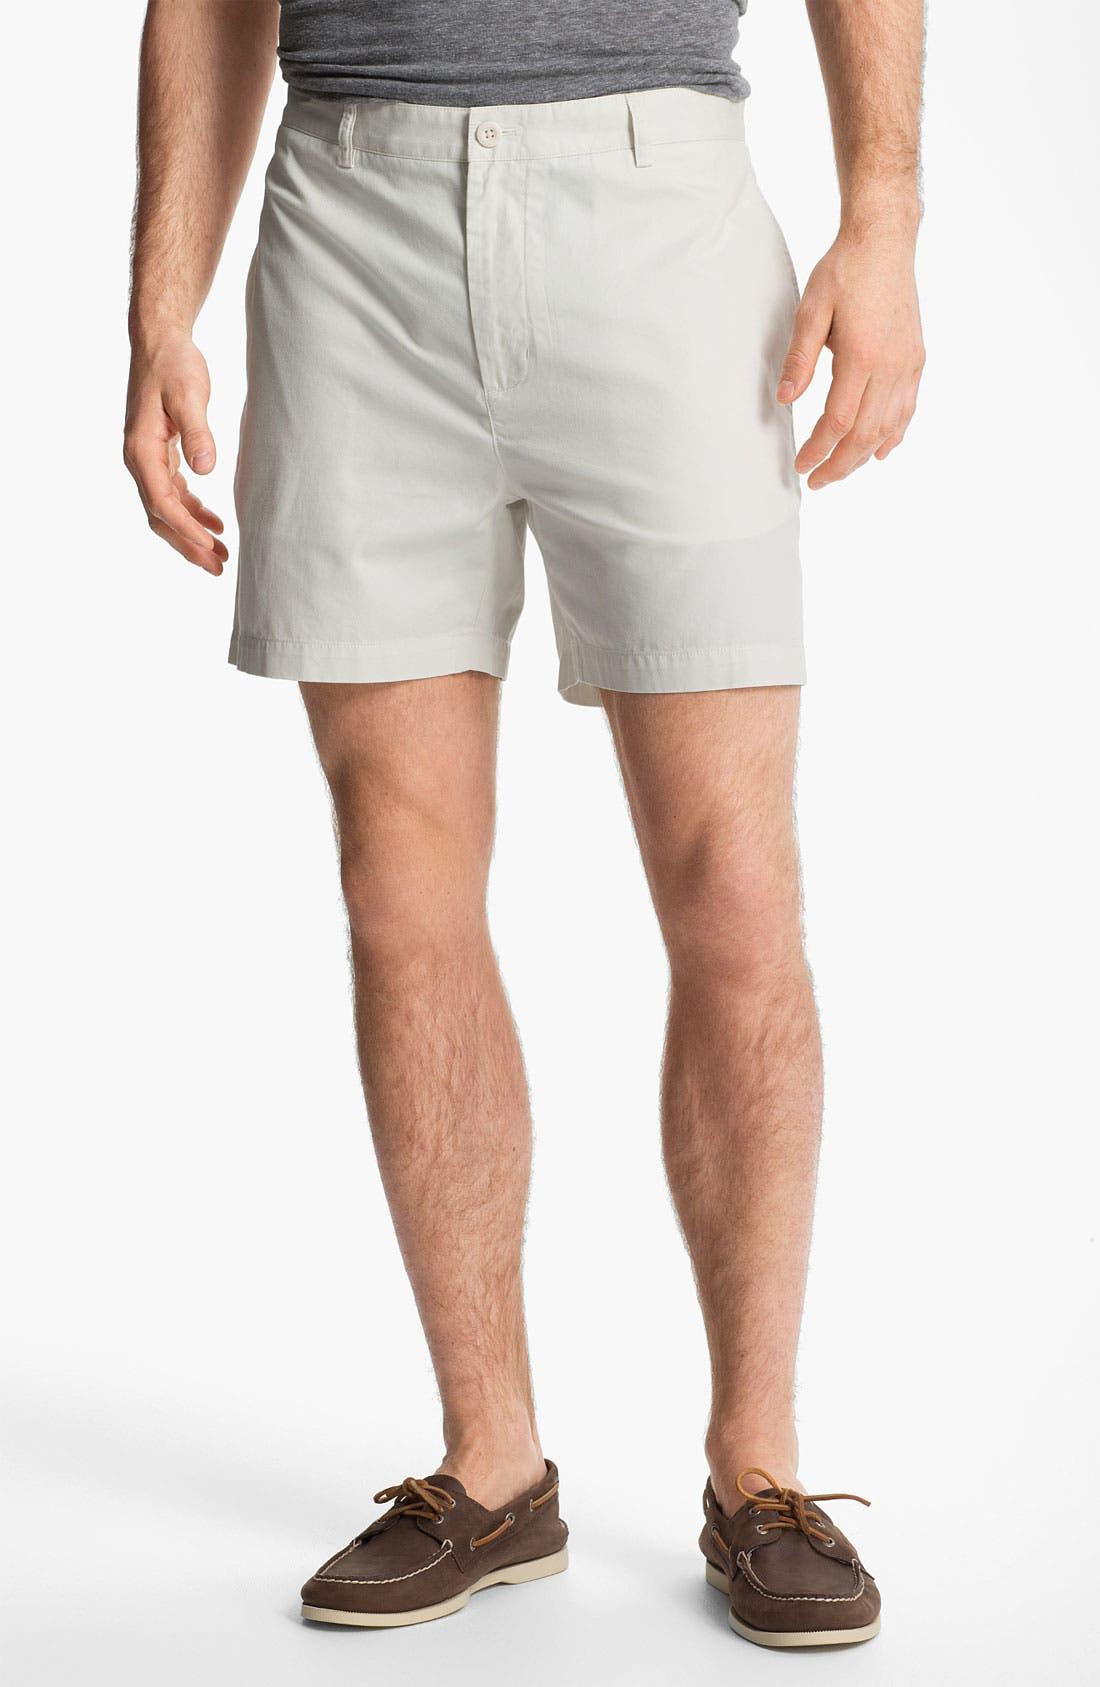 Alternate Image 1 Selected - Vineyard Vines 'Summer Club' Twill Shorts